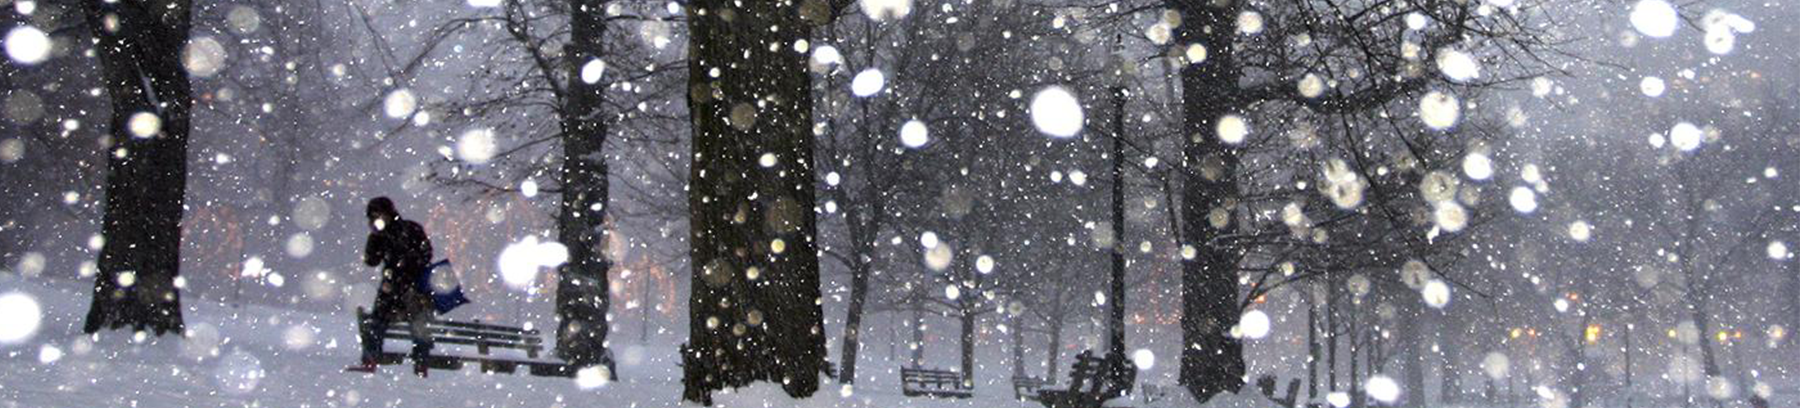 Century winter scene